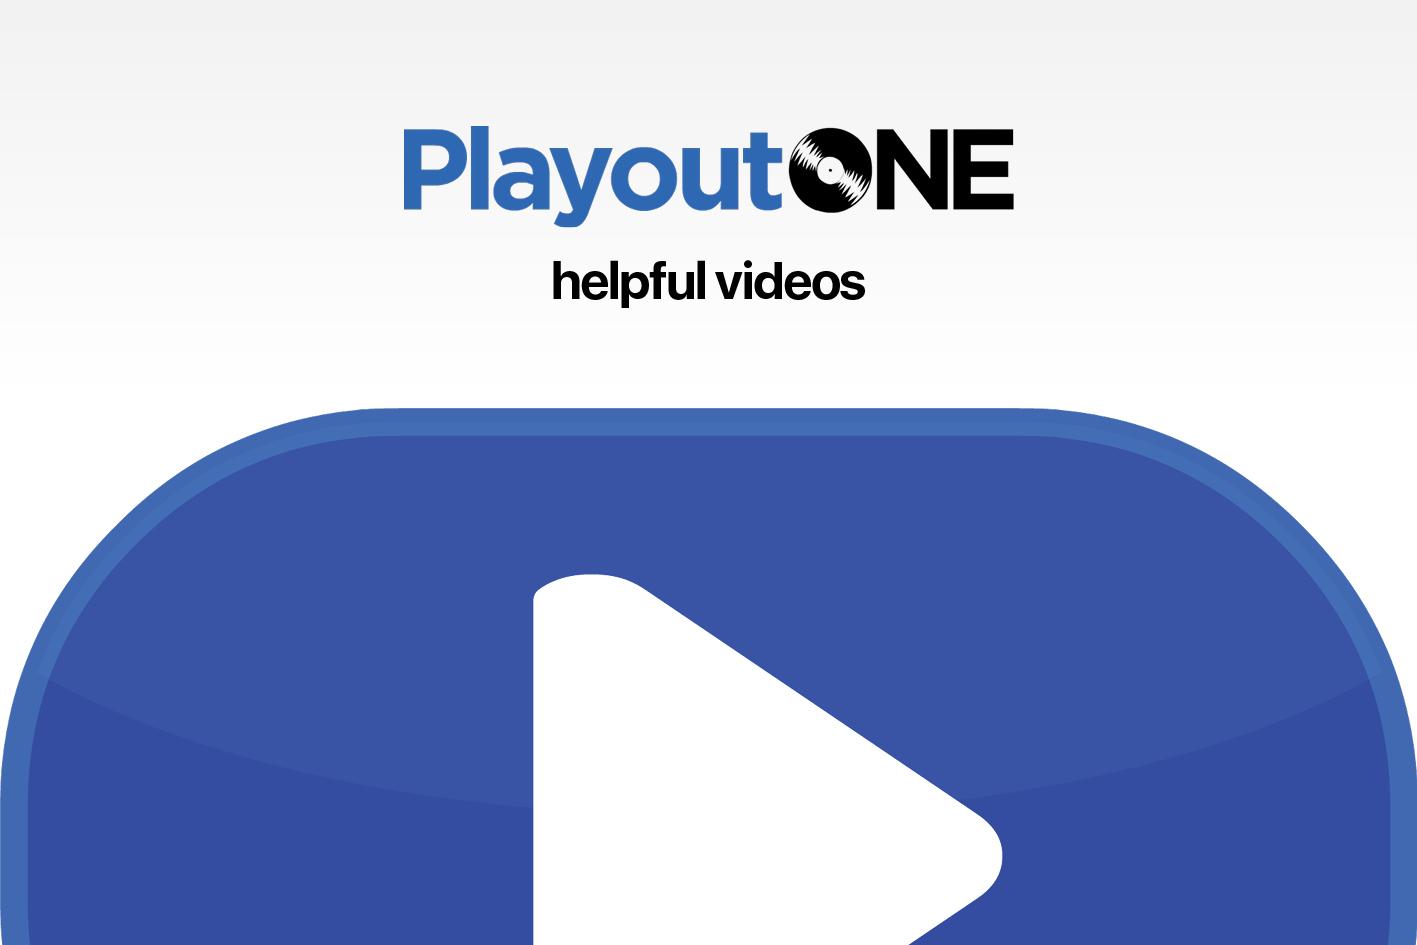 PlayoutONE Tutorial Videos